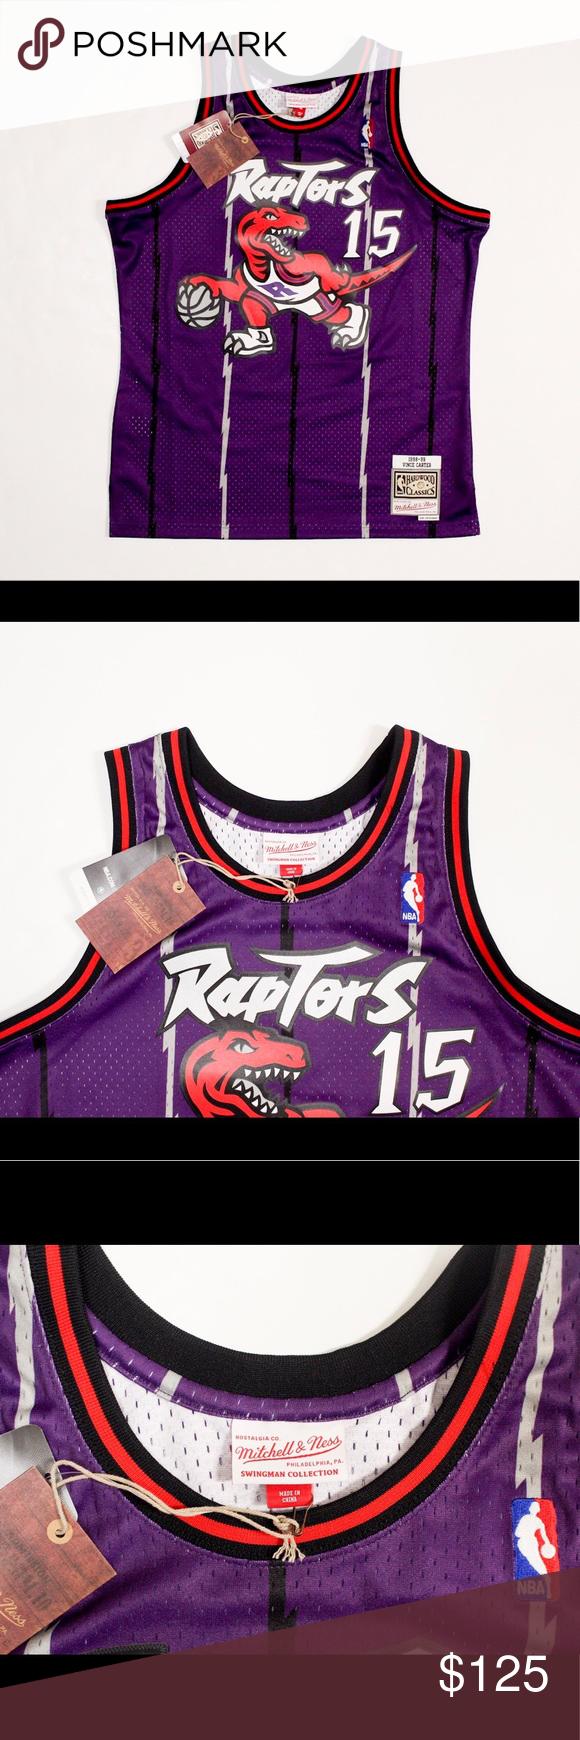 b3cba48bb62 Vince Carter 1998-99 HWC Swingman Jersey - Vince Carter 1998-99 Toronto  Raptors